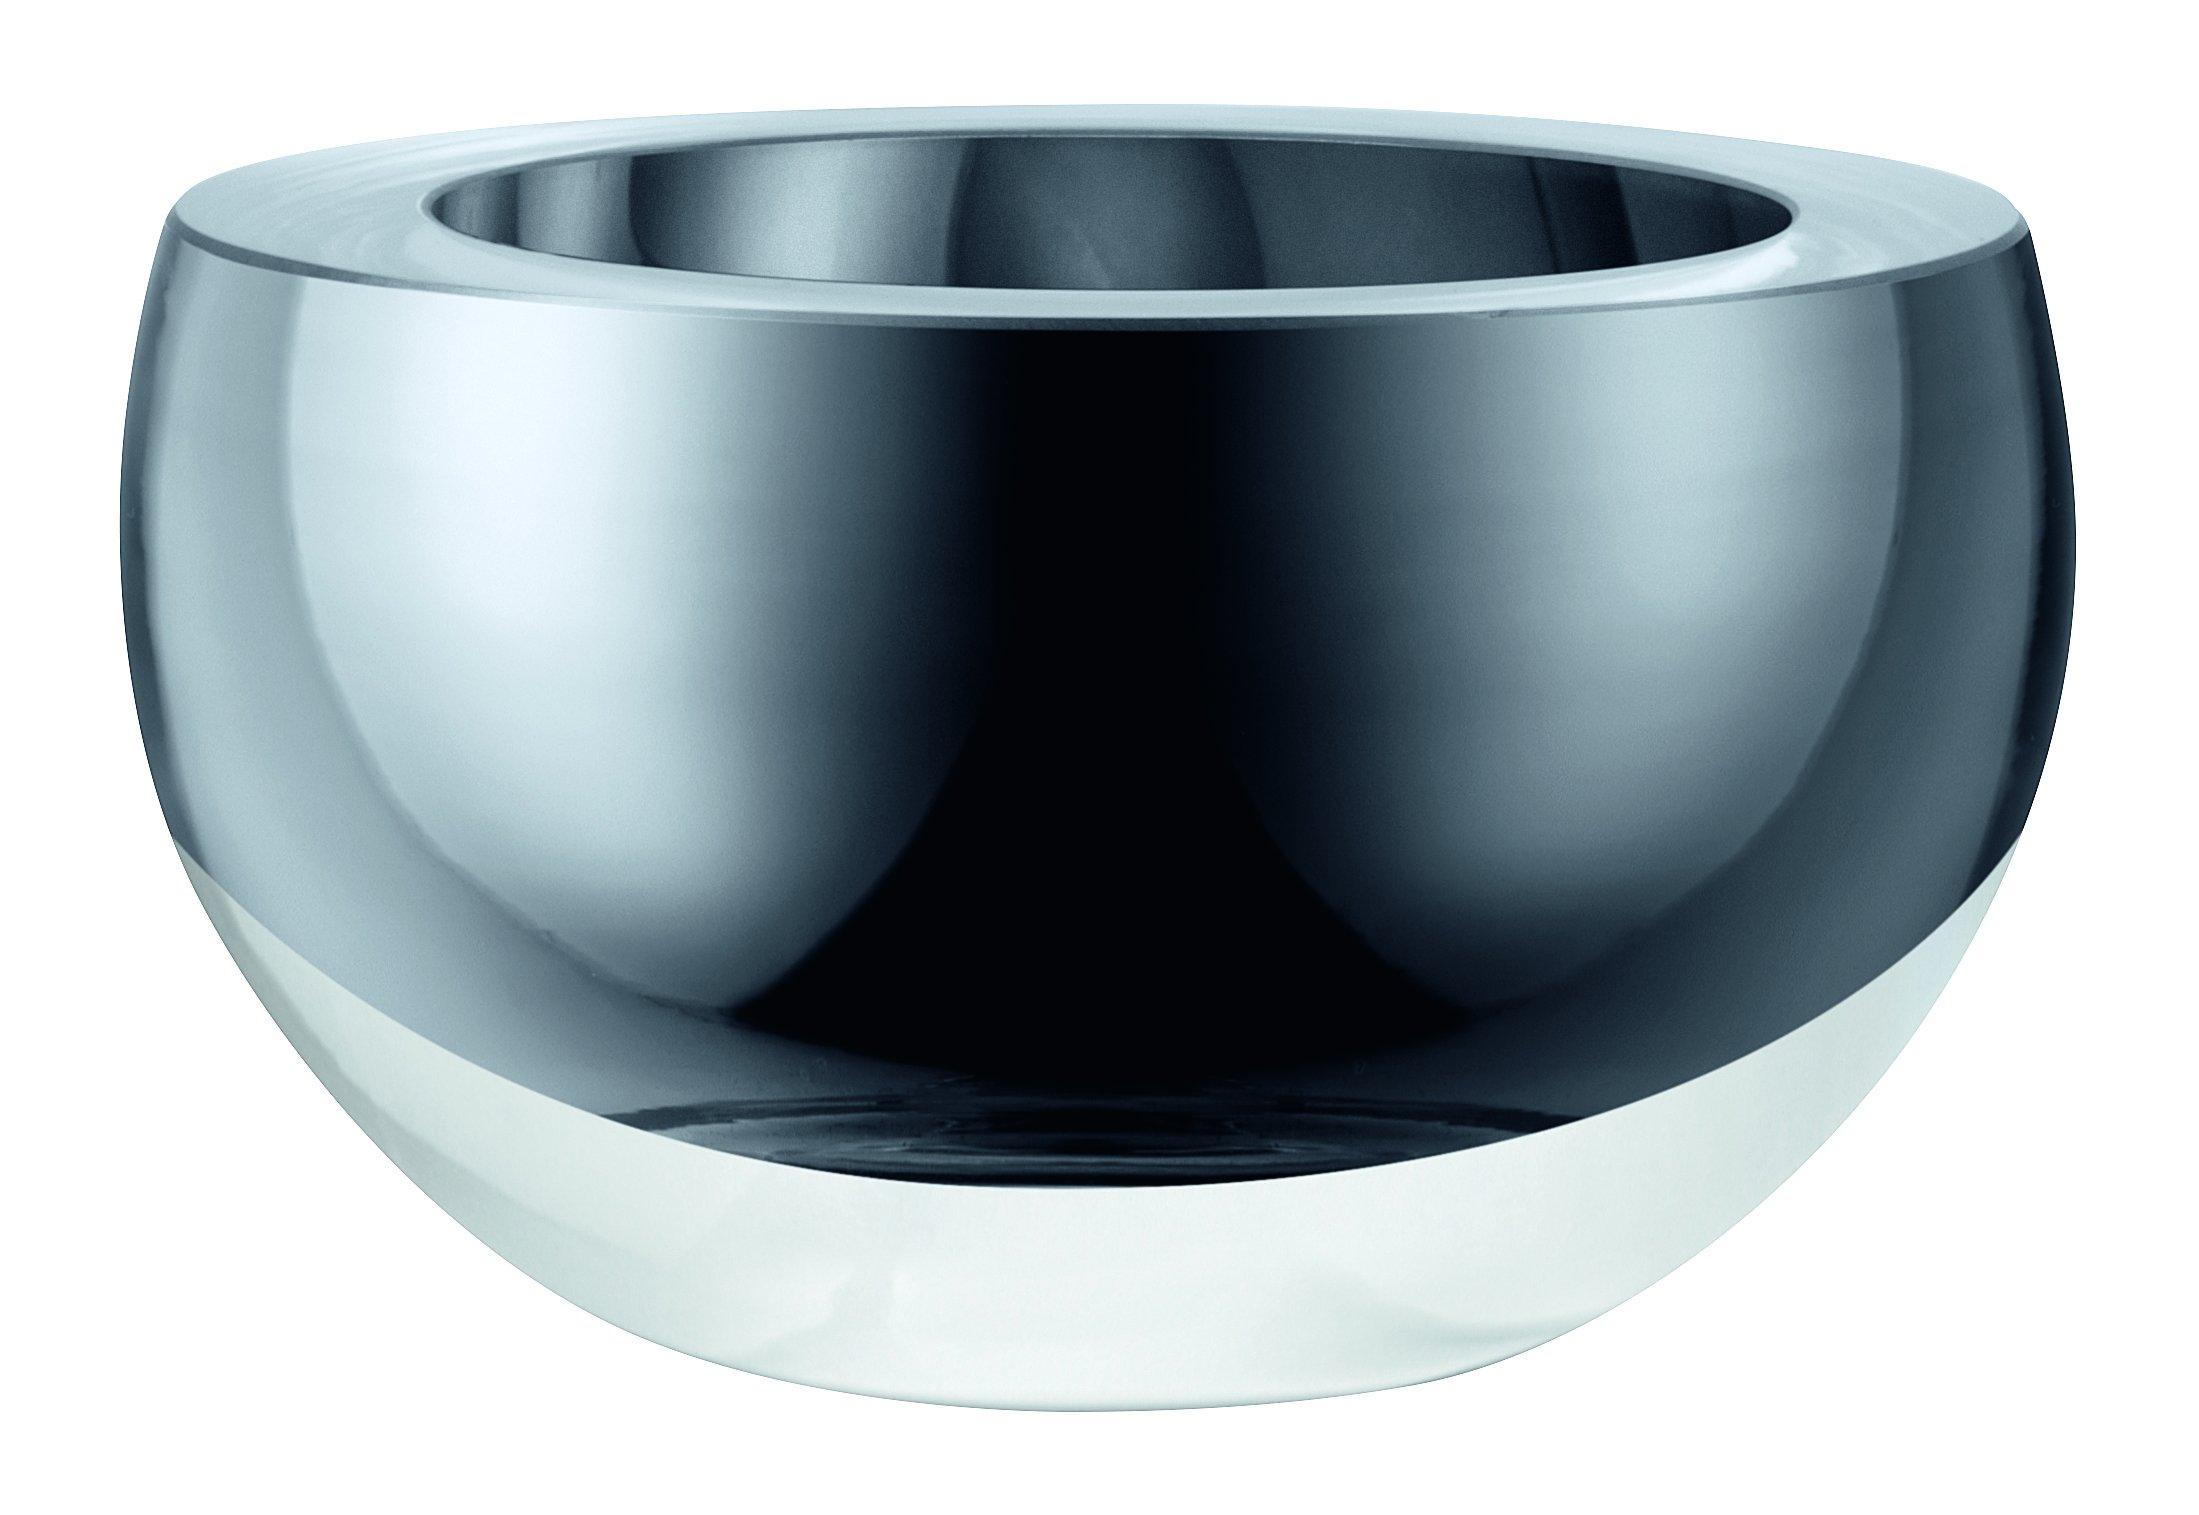 LSA International G1182-09-359 Host Decorative bowl, Ø3.75in/H2.25in, Platinum